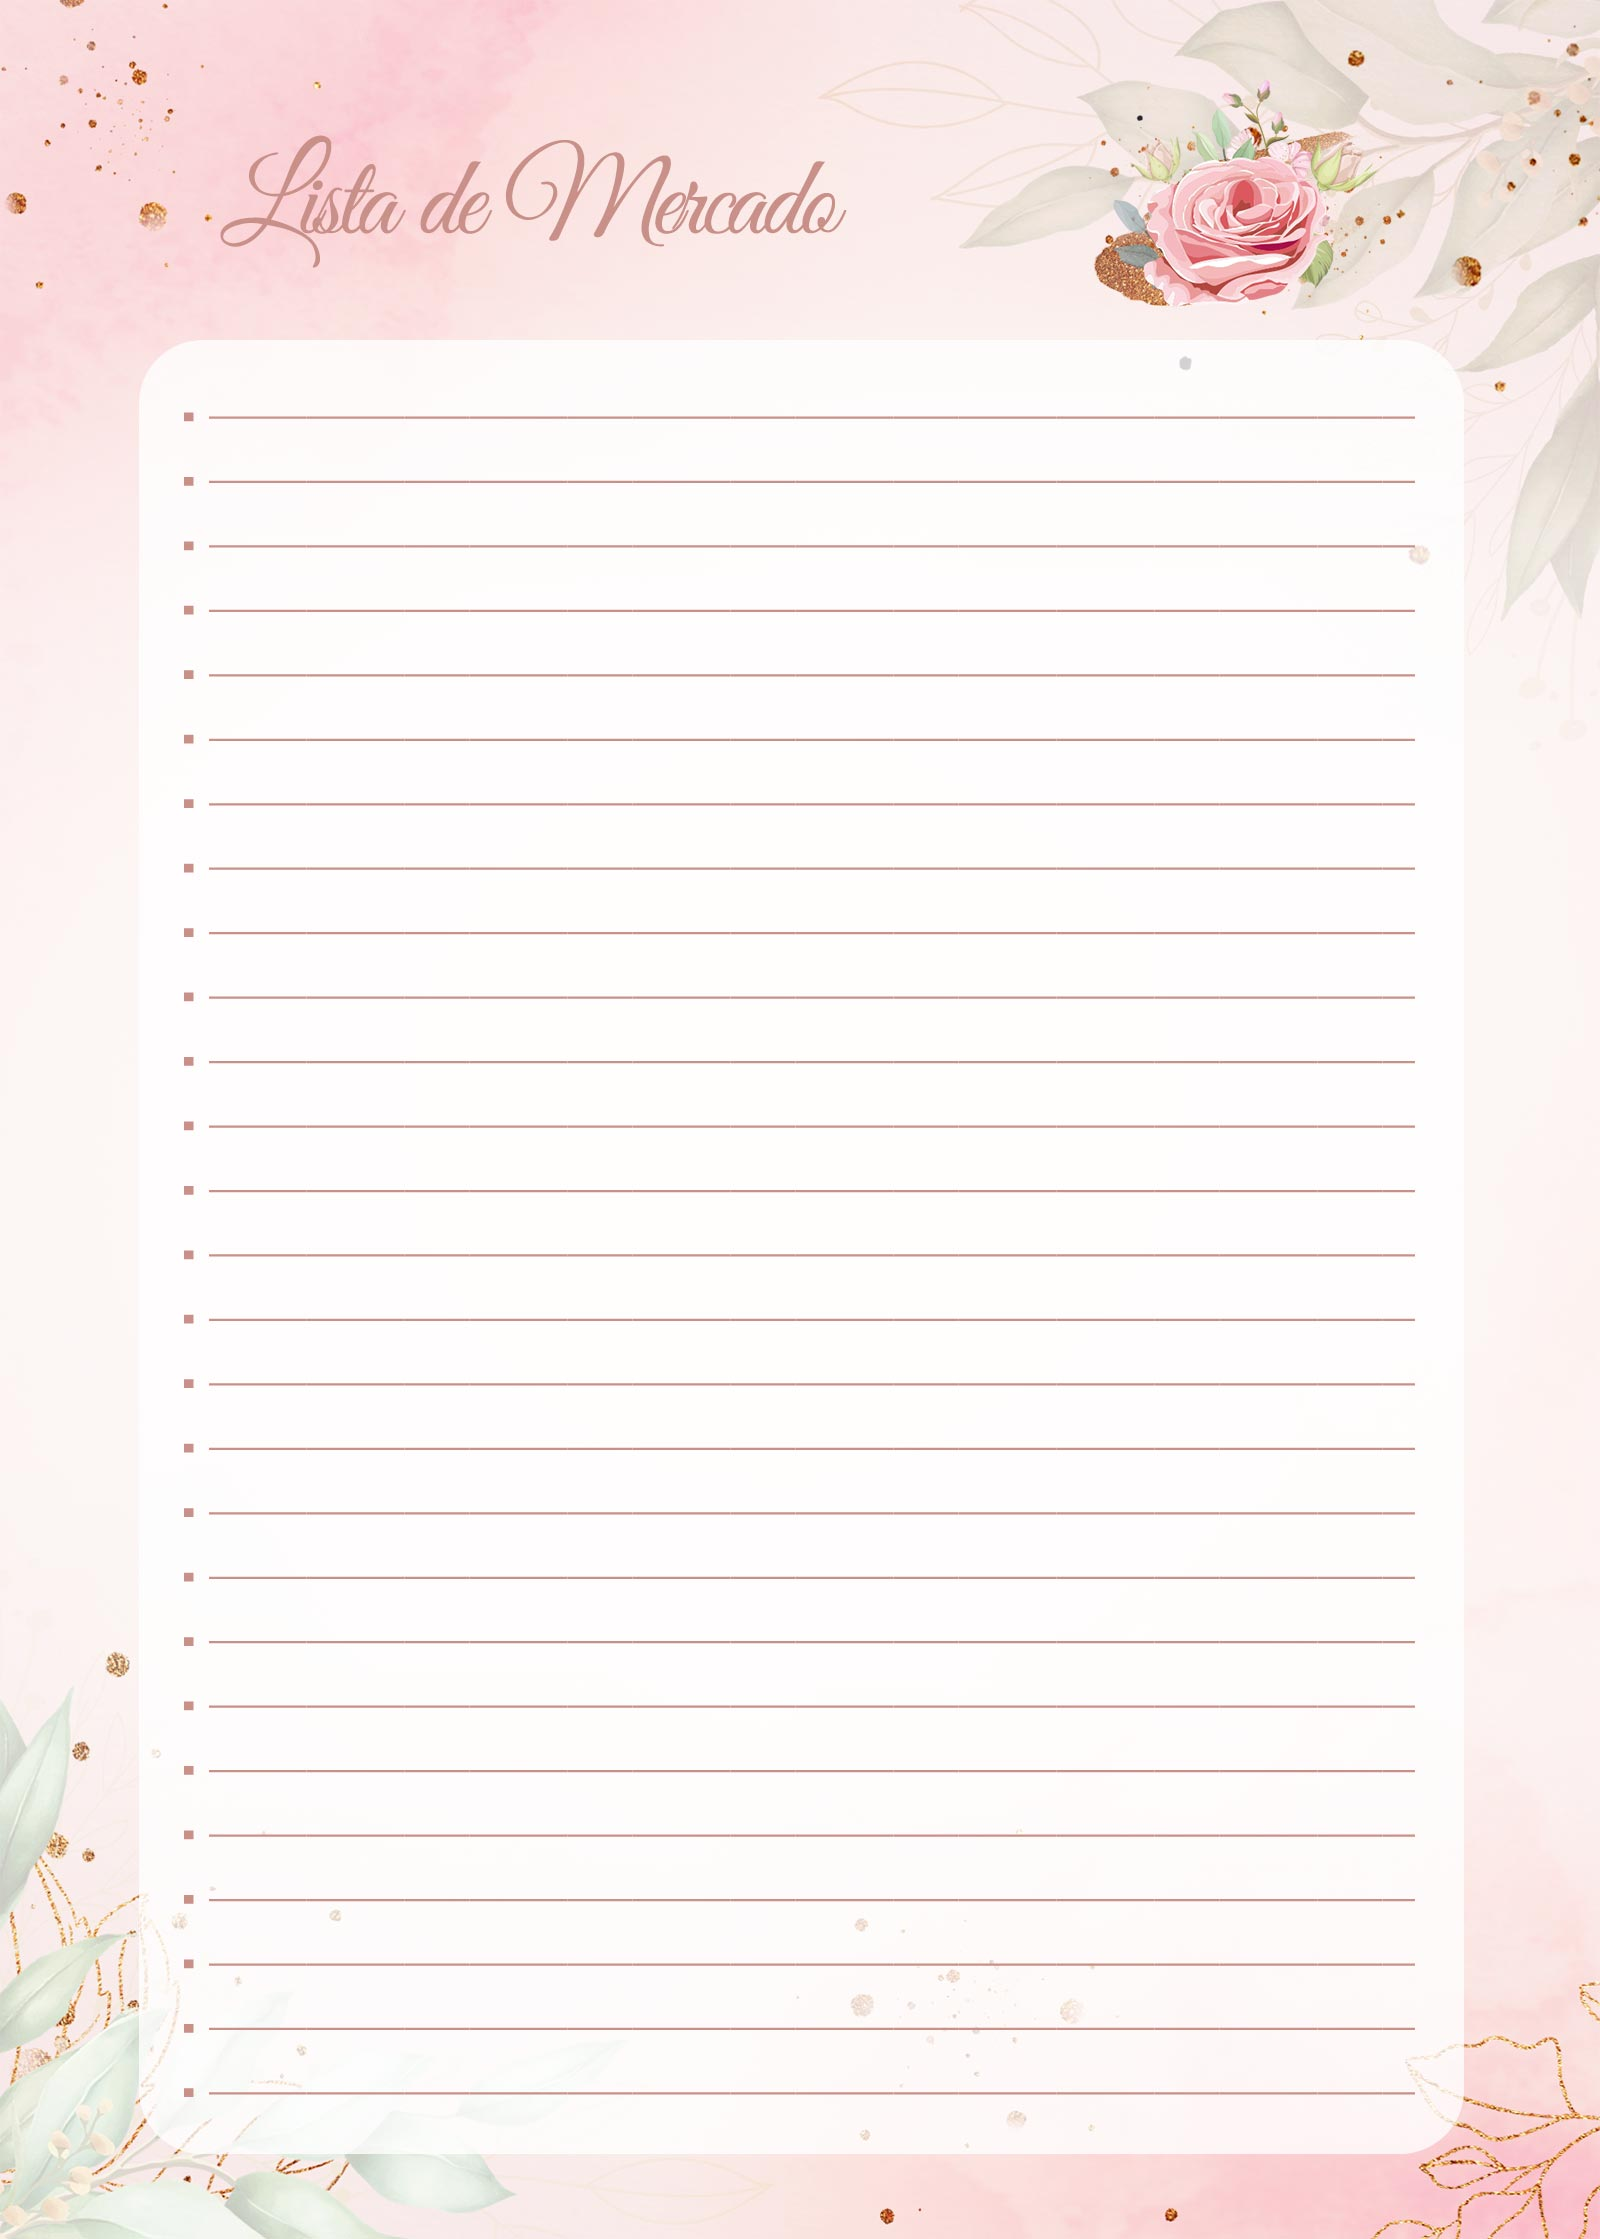 Planner 2021 Floral com Inicial Lista de Mercado